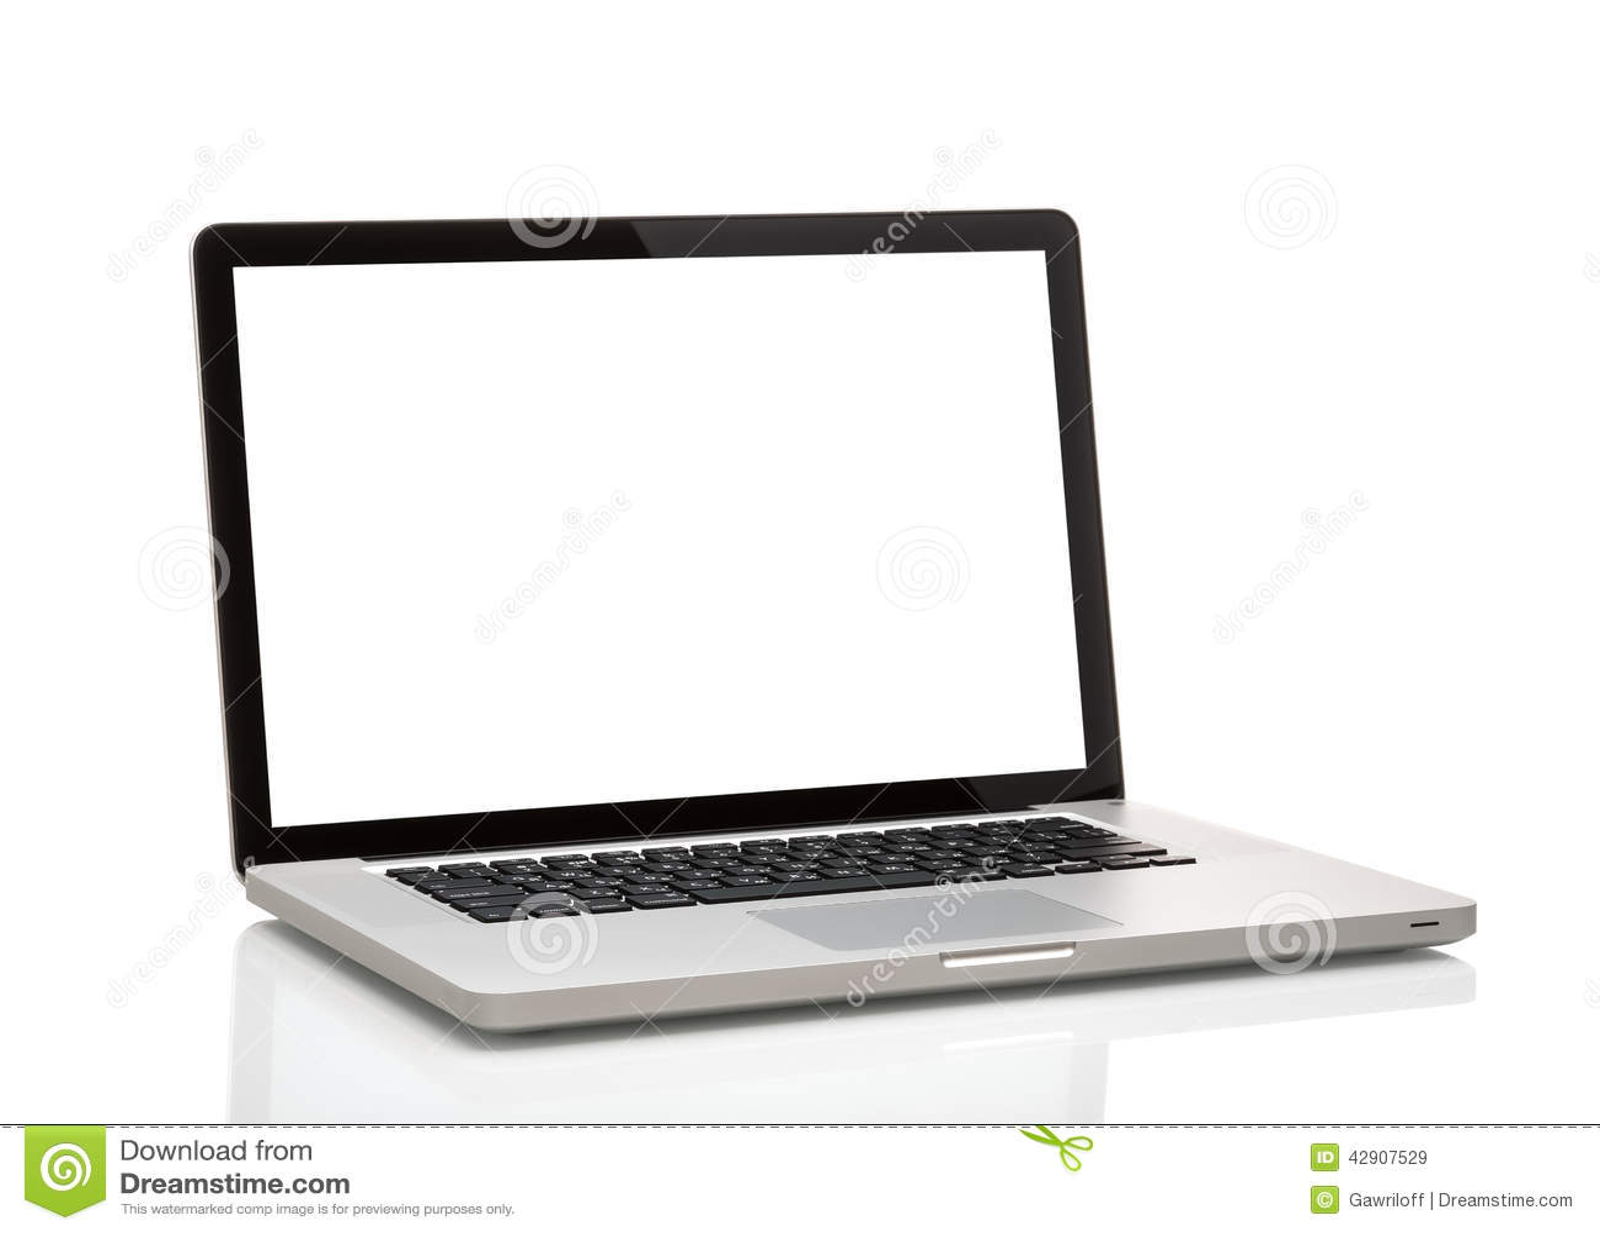 Laptop, like macbook with blank screen.